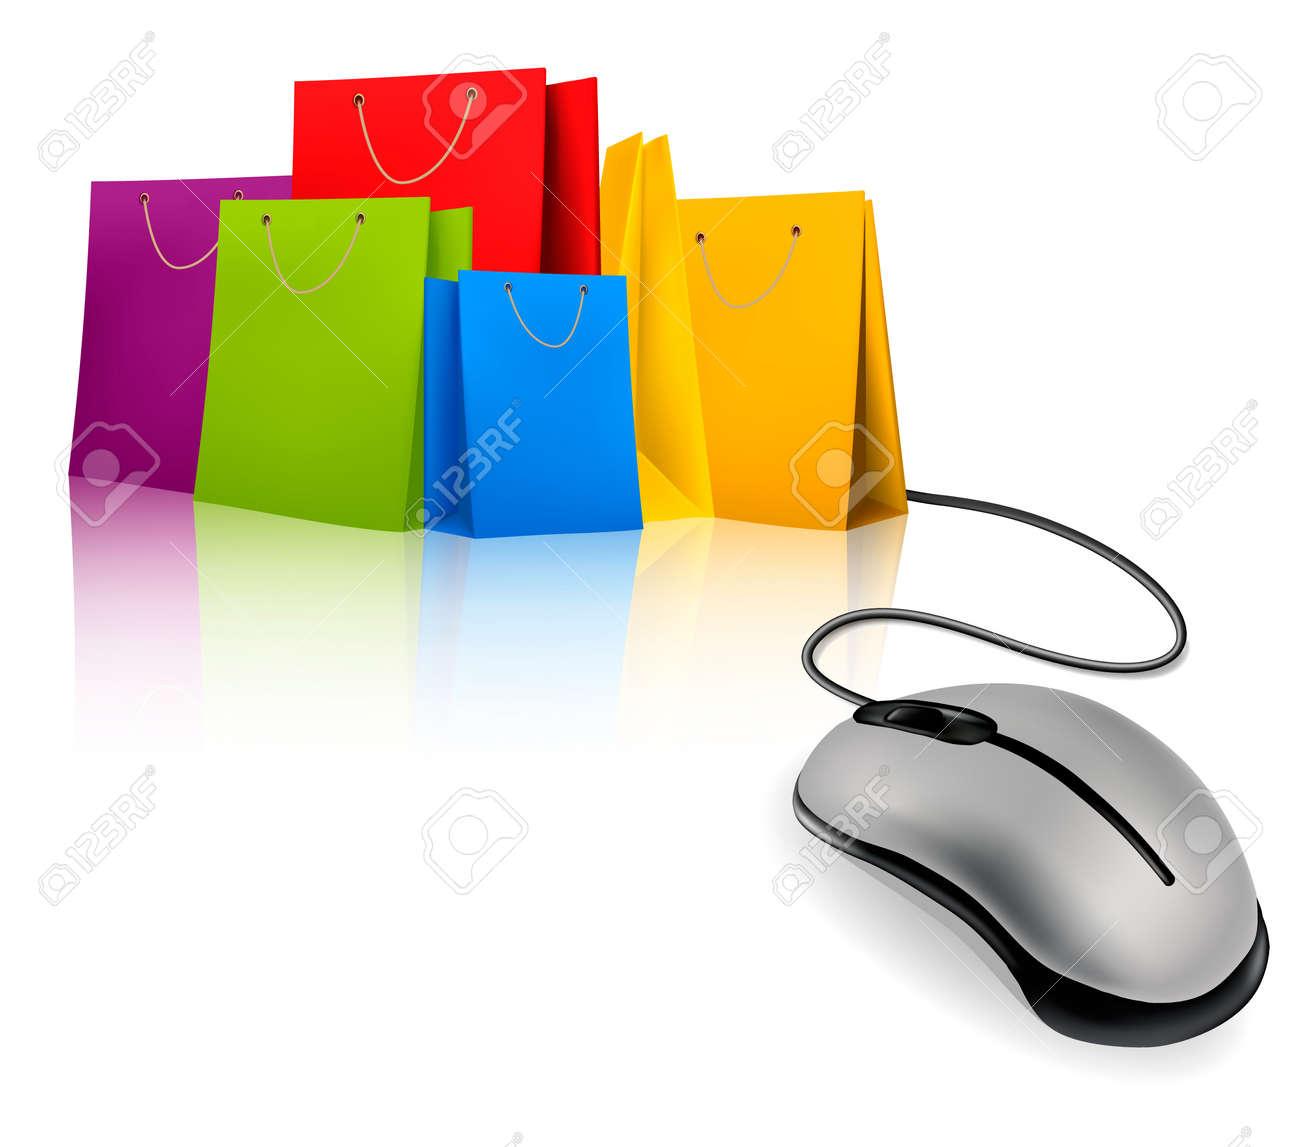 Shopping Bags And Computer Mouse. Concept Of E-shopping. Vector ...